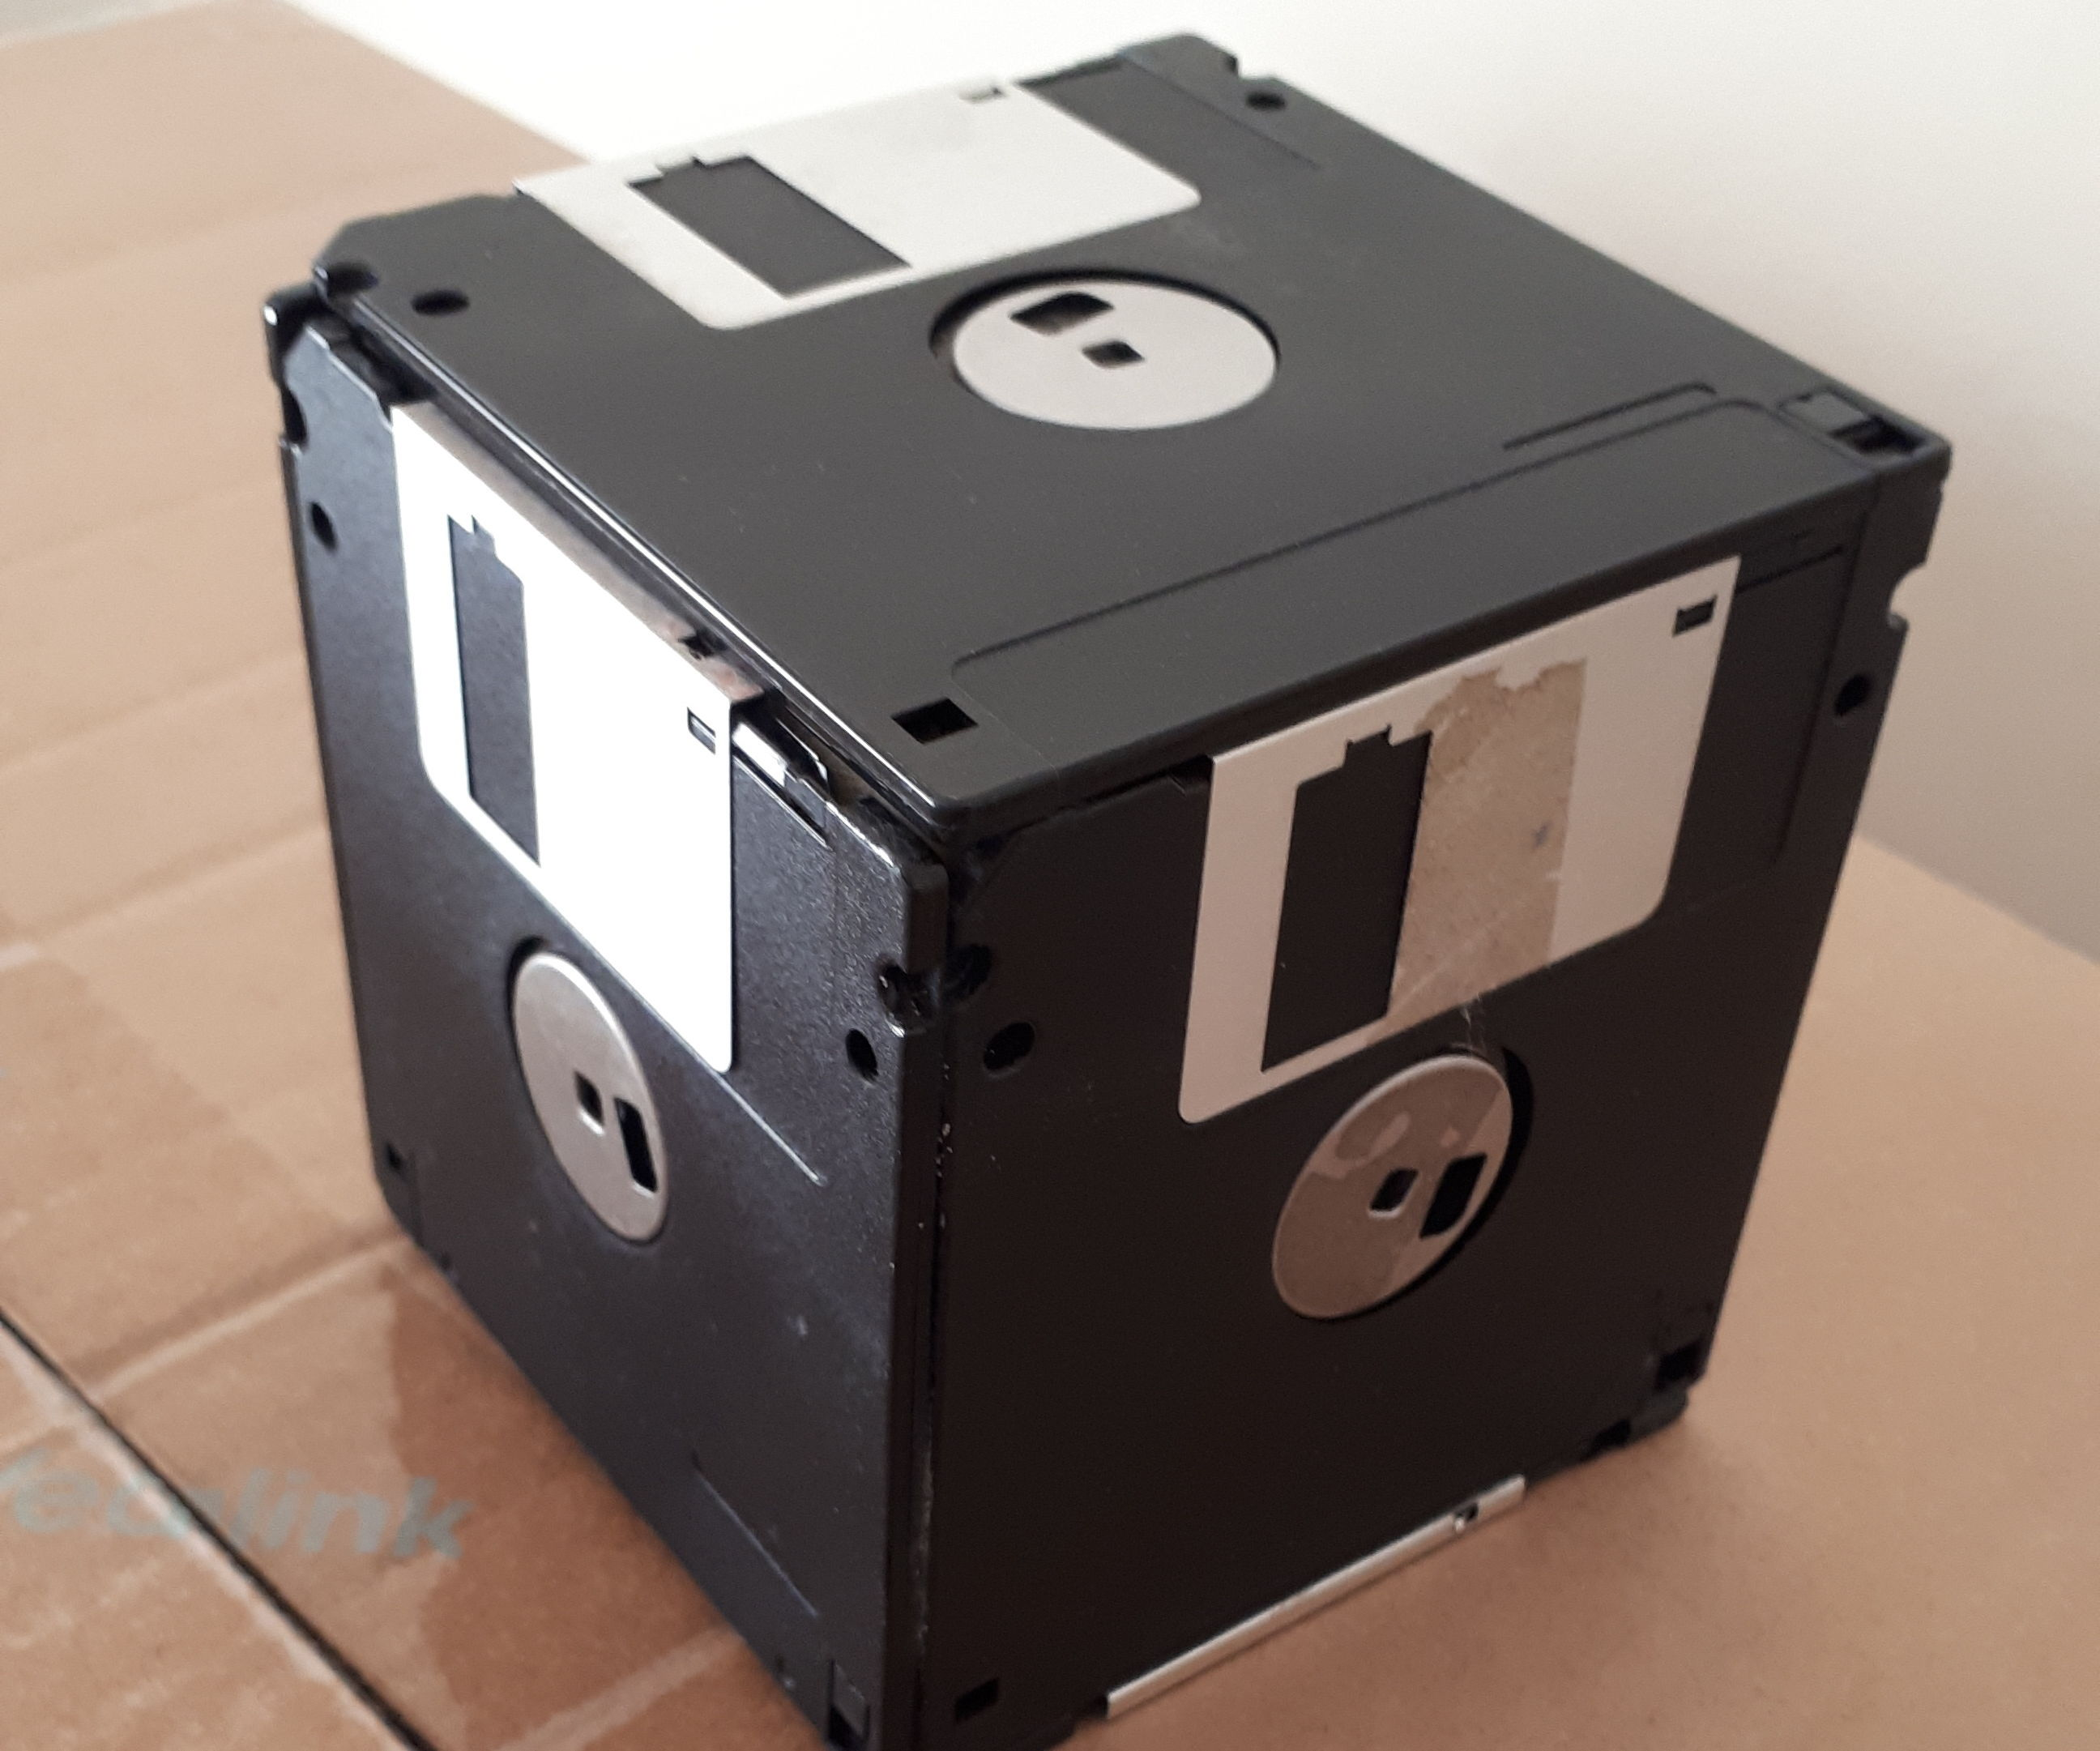 Diskette/Floppy Disk Box